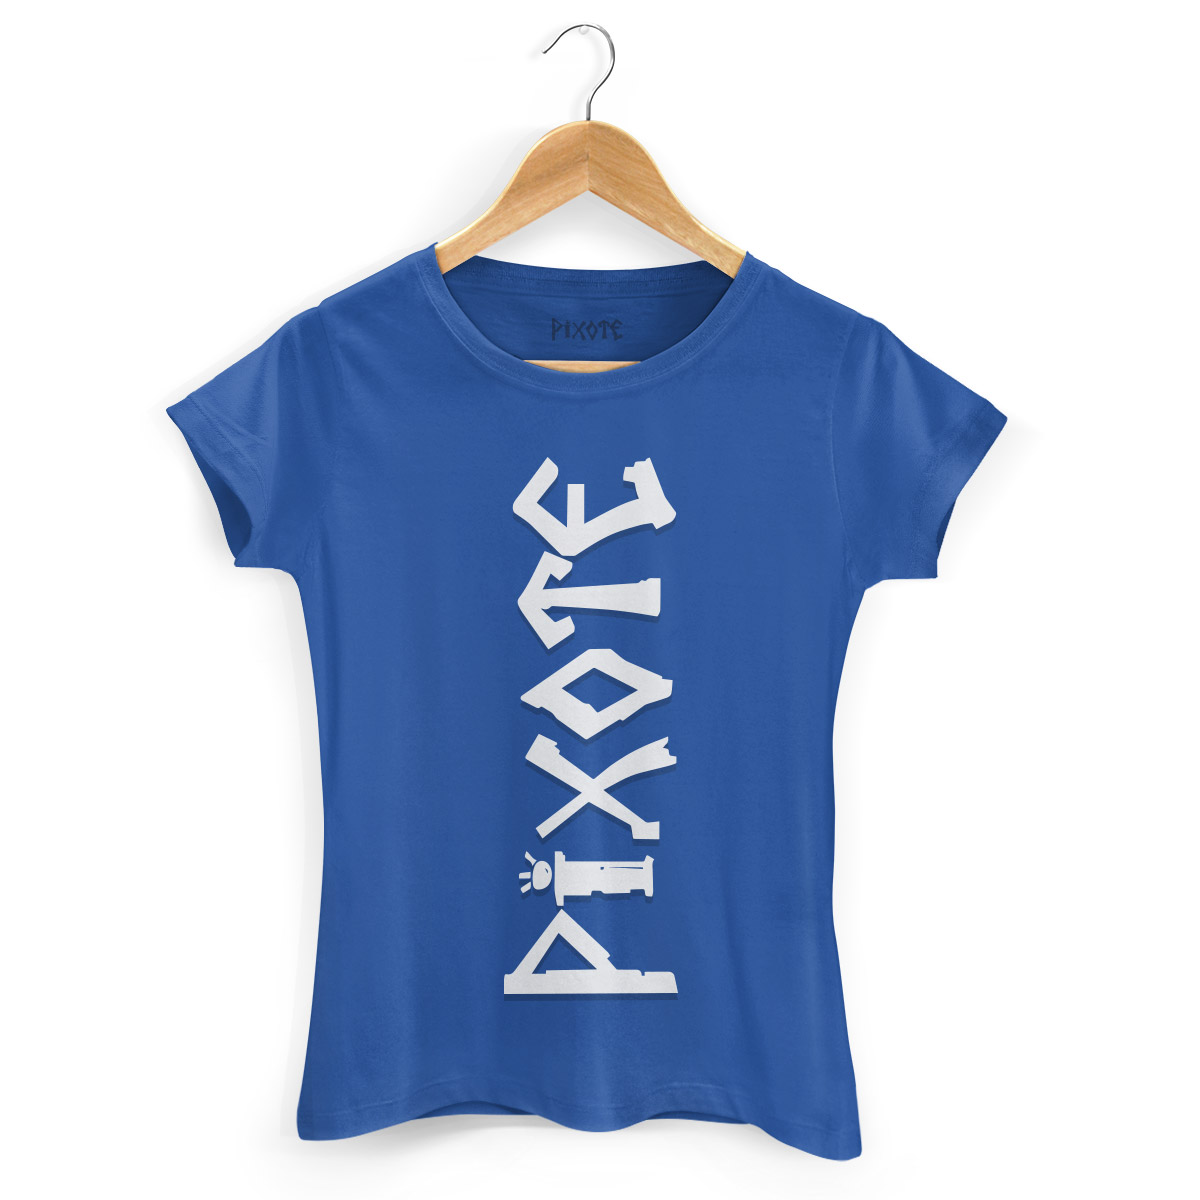 Camiseta Feminina Pixote Logo Blue